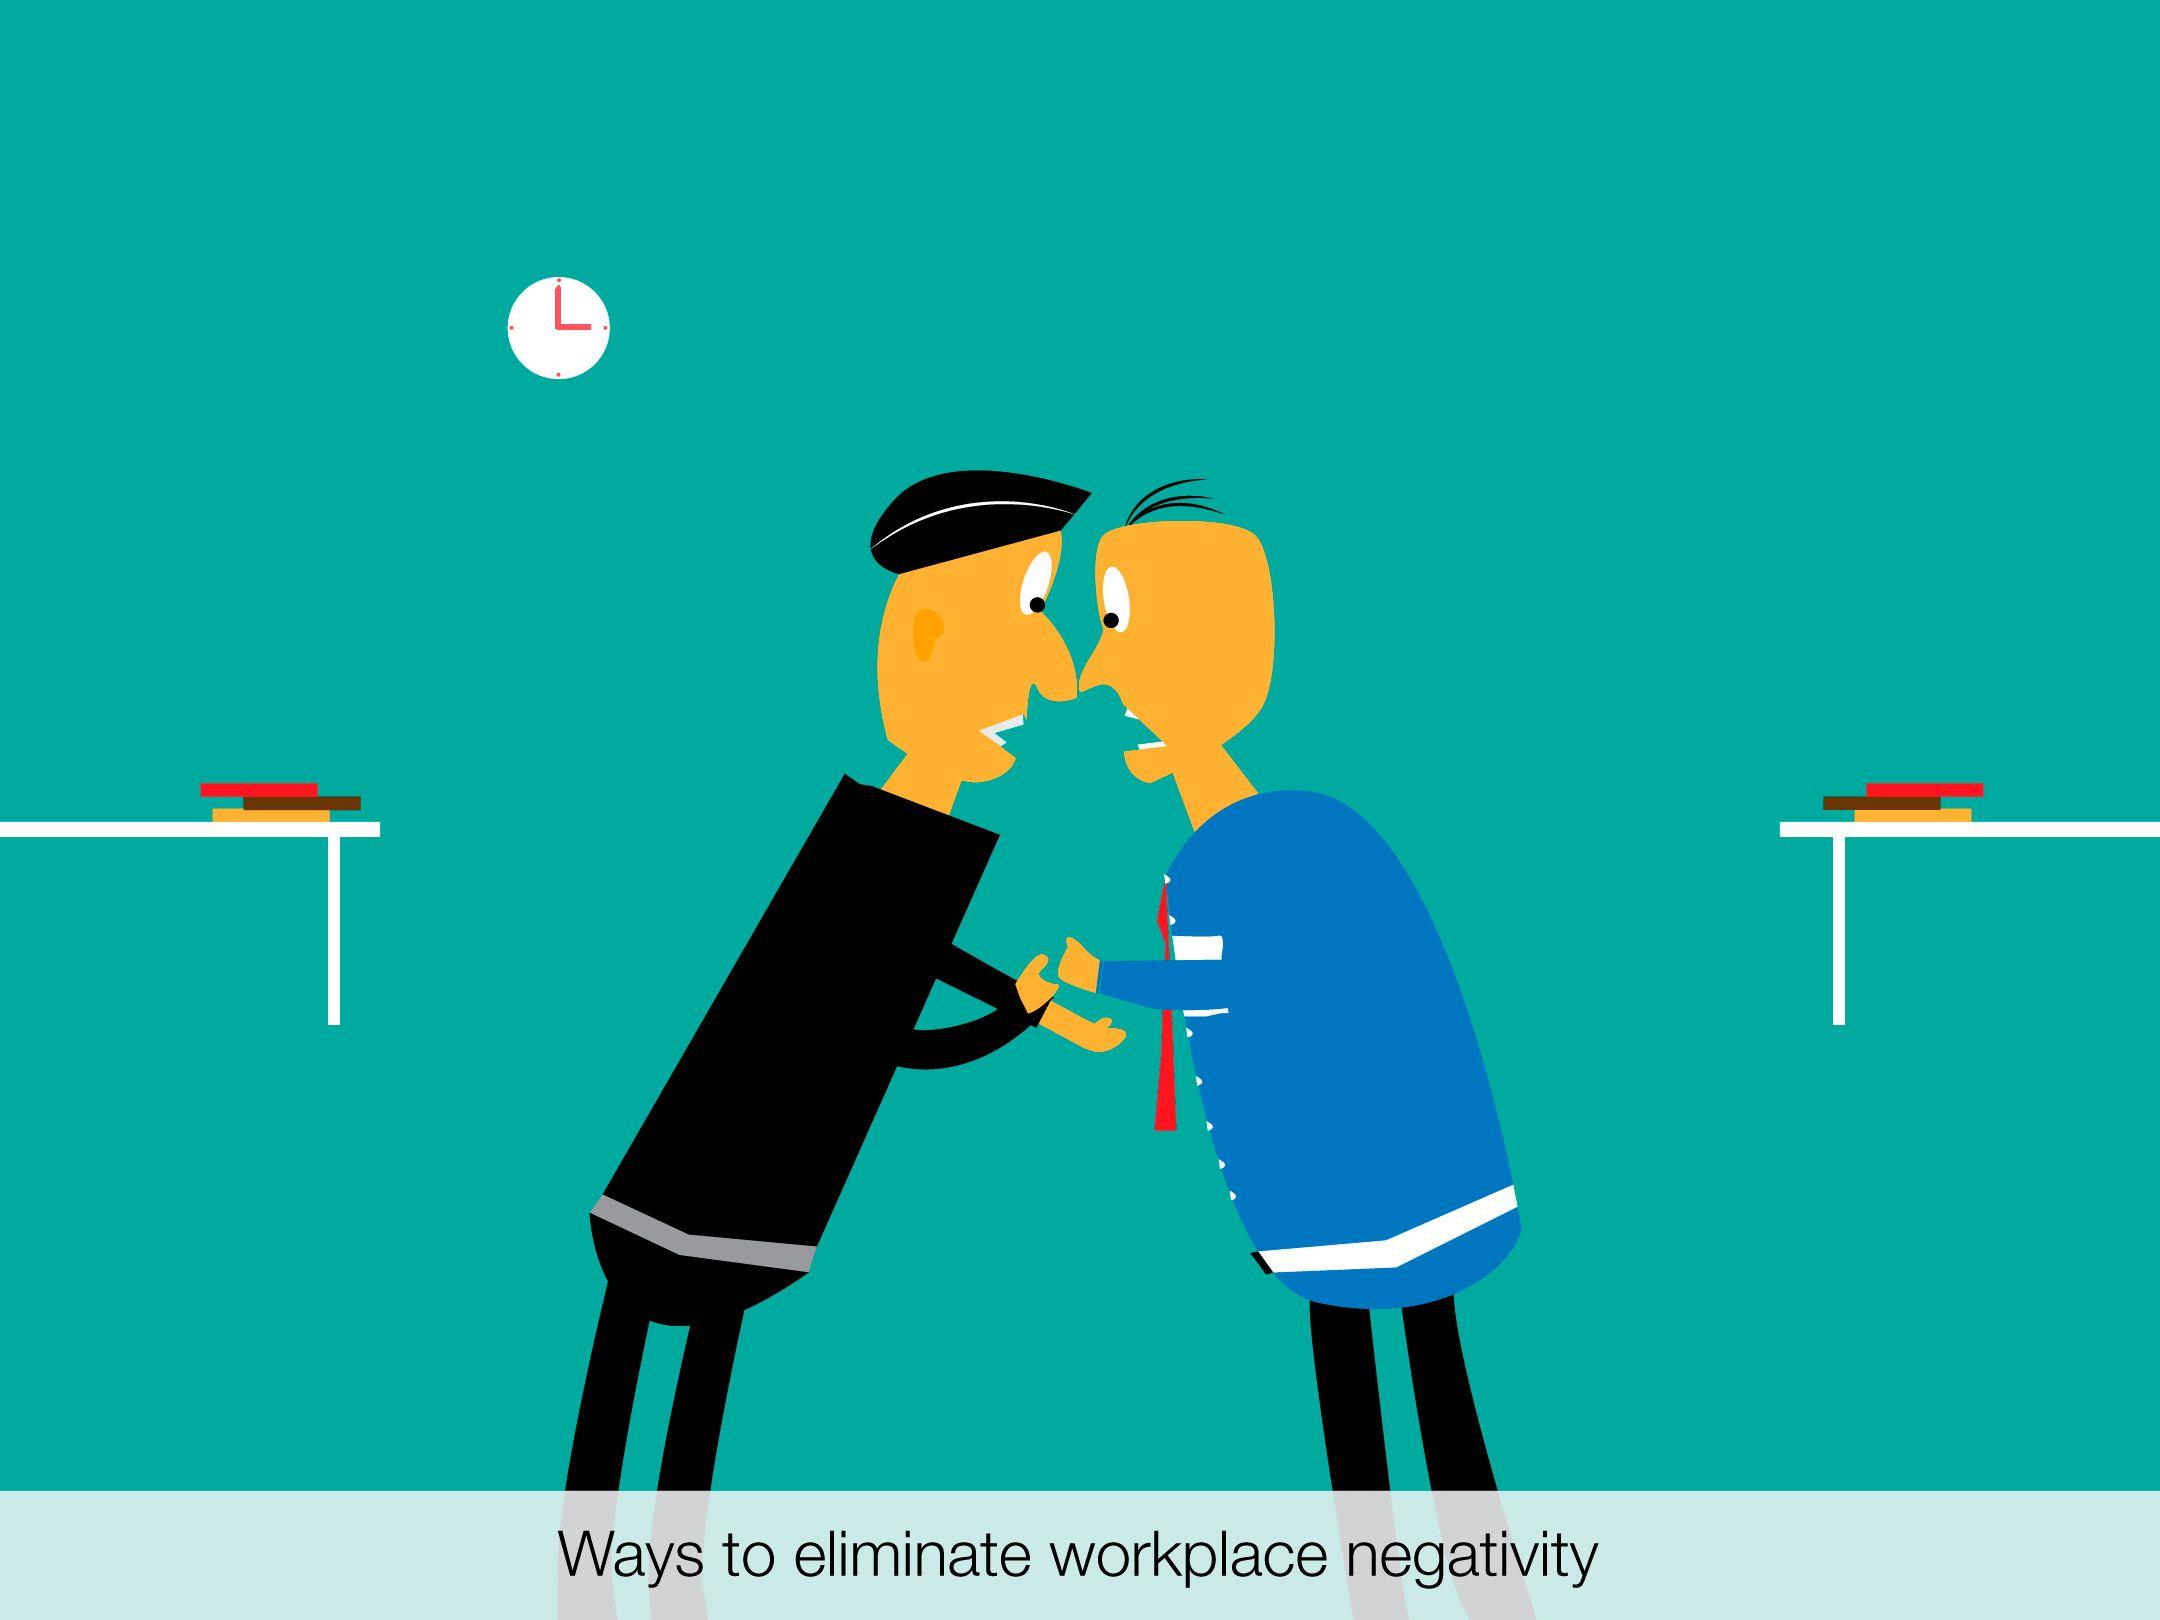 Ways to eliminate workplace negativity